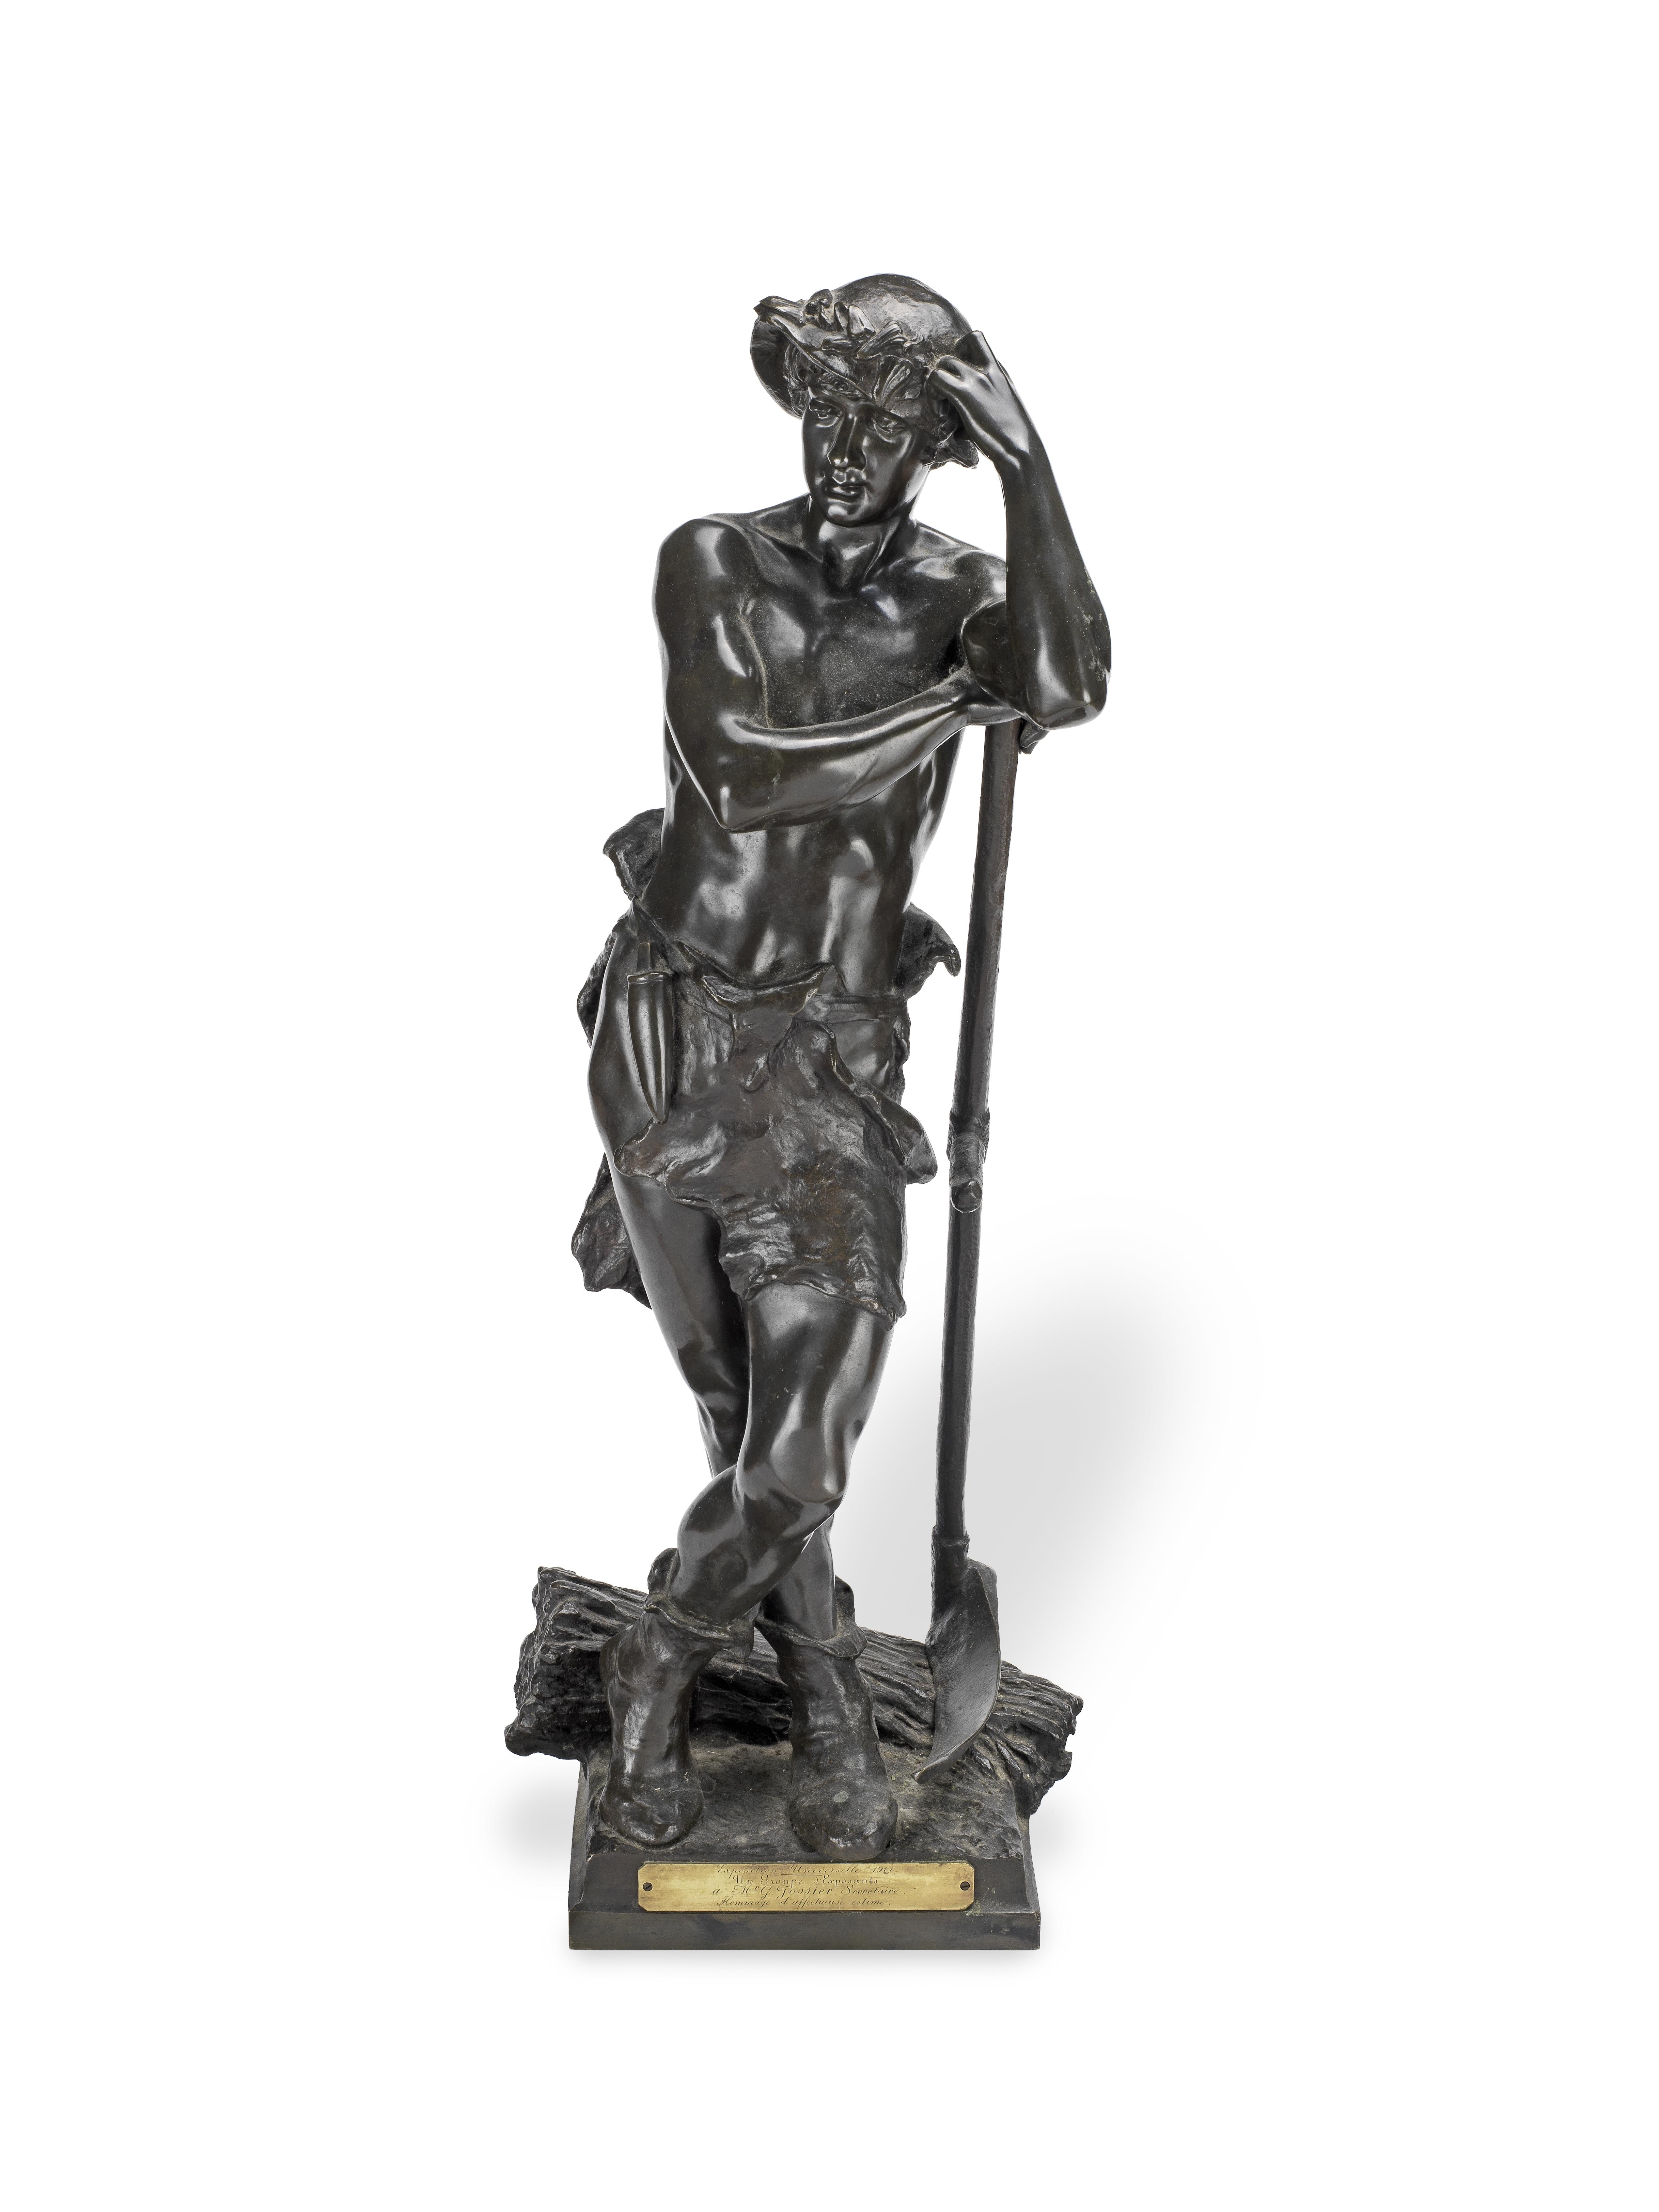 Eugène Marioton (French, 1854 - 1925): A patinated bronze figure of a farm hand